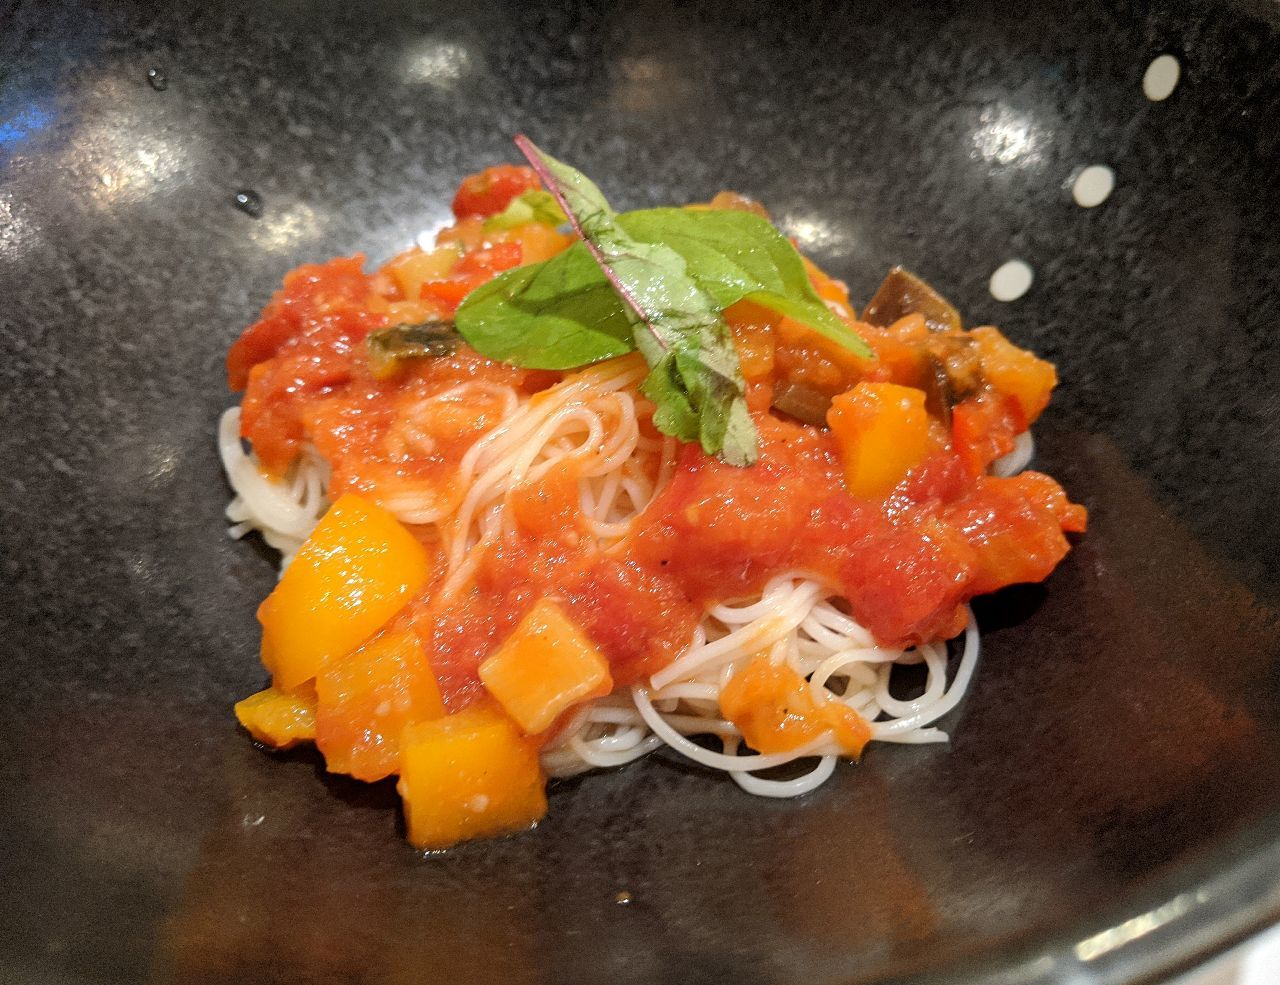 MVIMG_20200723_173249夏野菜のトマトそうめん